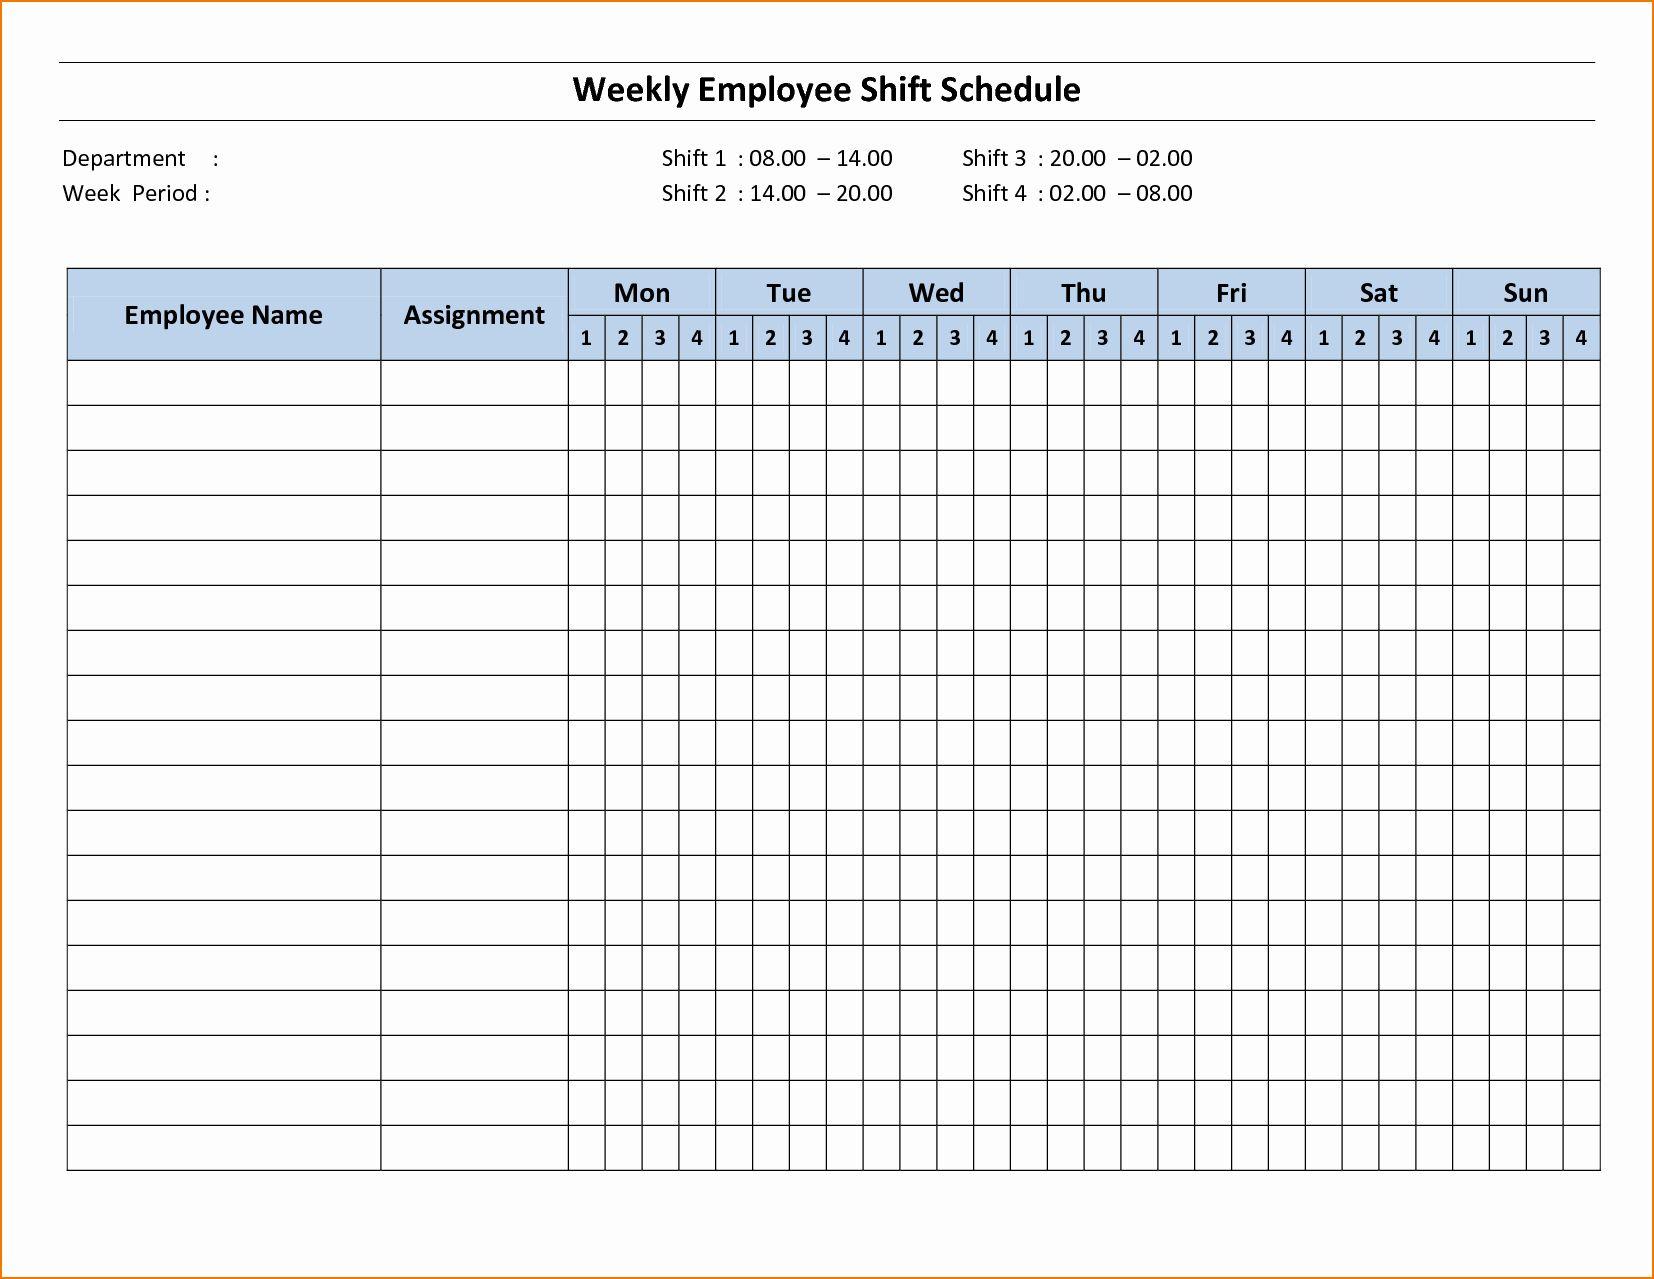 2 Week Schedule Template Awesome 3 Week Schedule Template Schedule Template Weekly Calendar Template Calendar Template